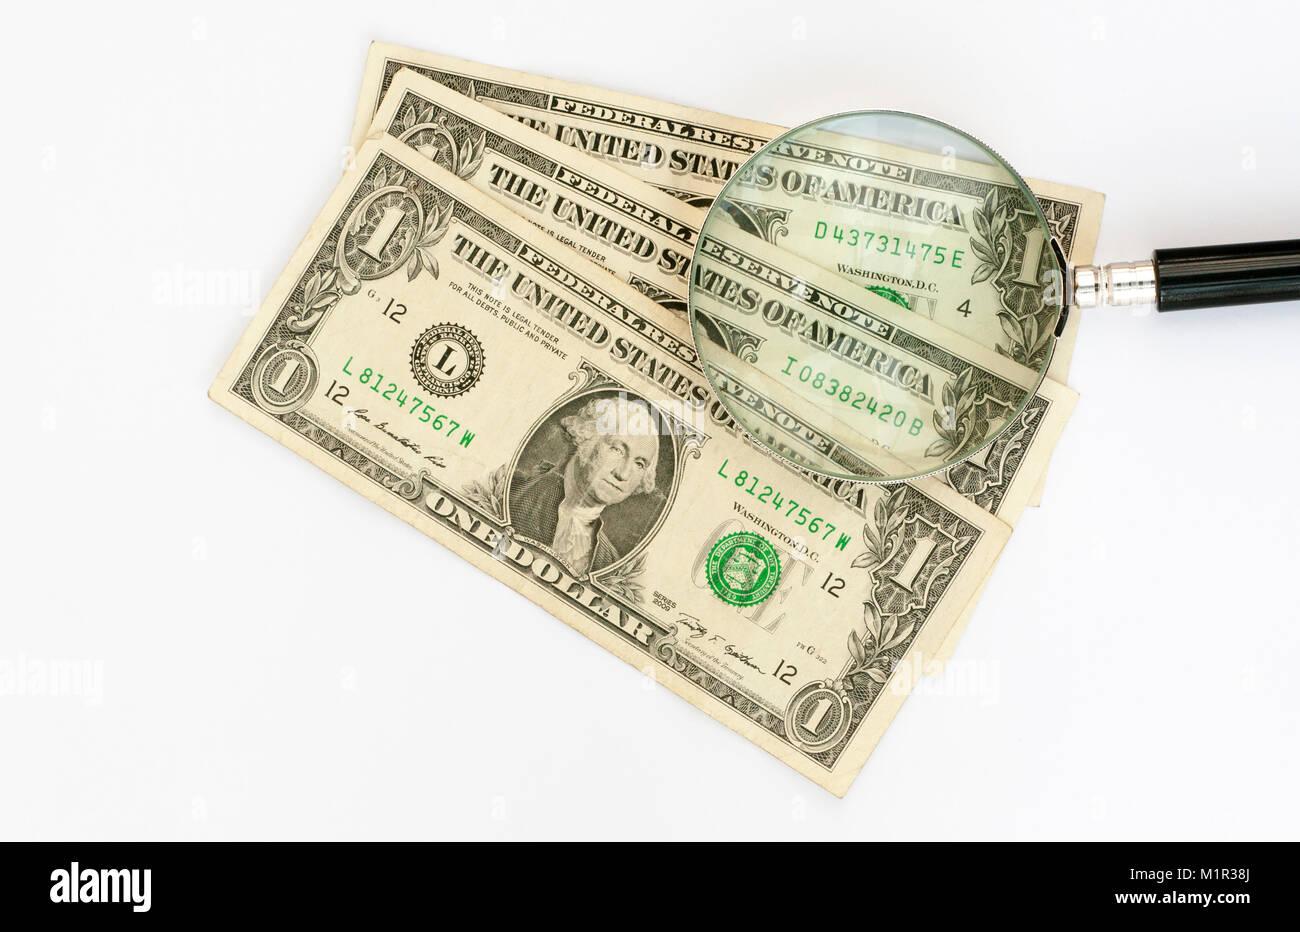 United States USA Dollars under the microscope - Stock Image